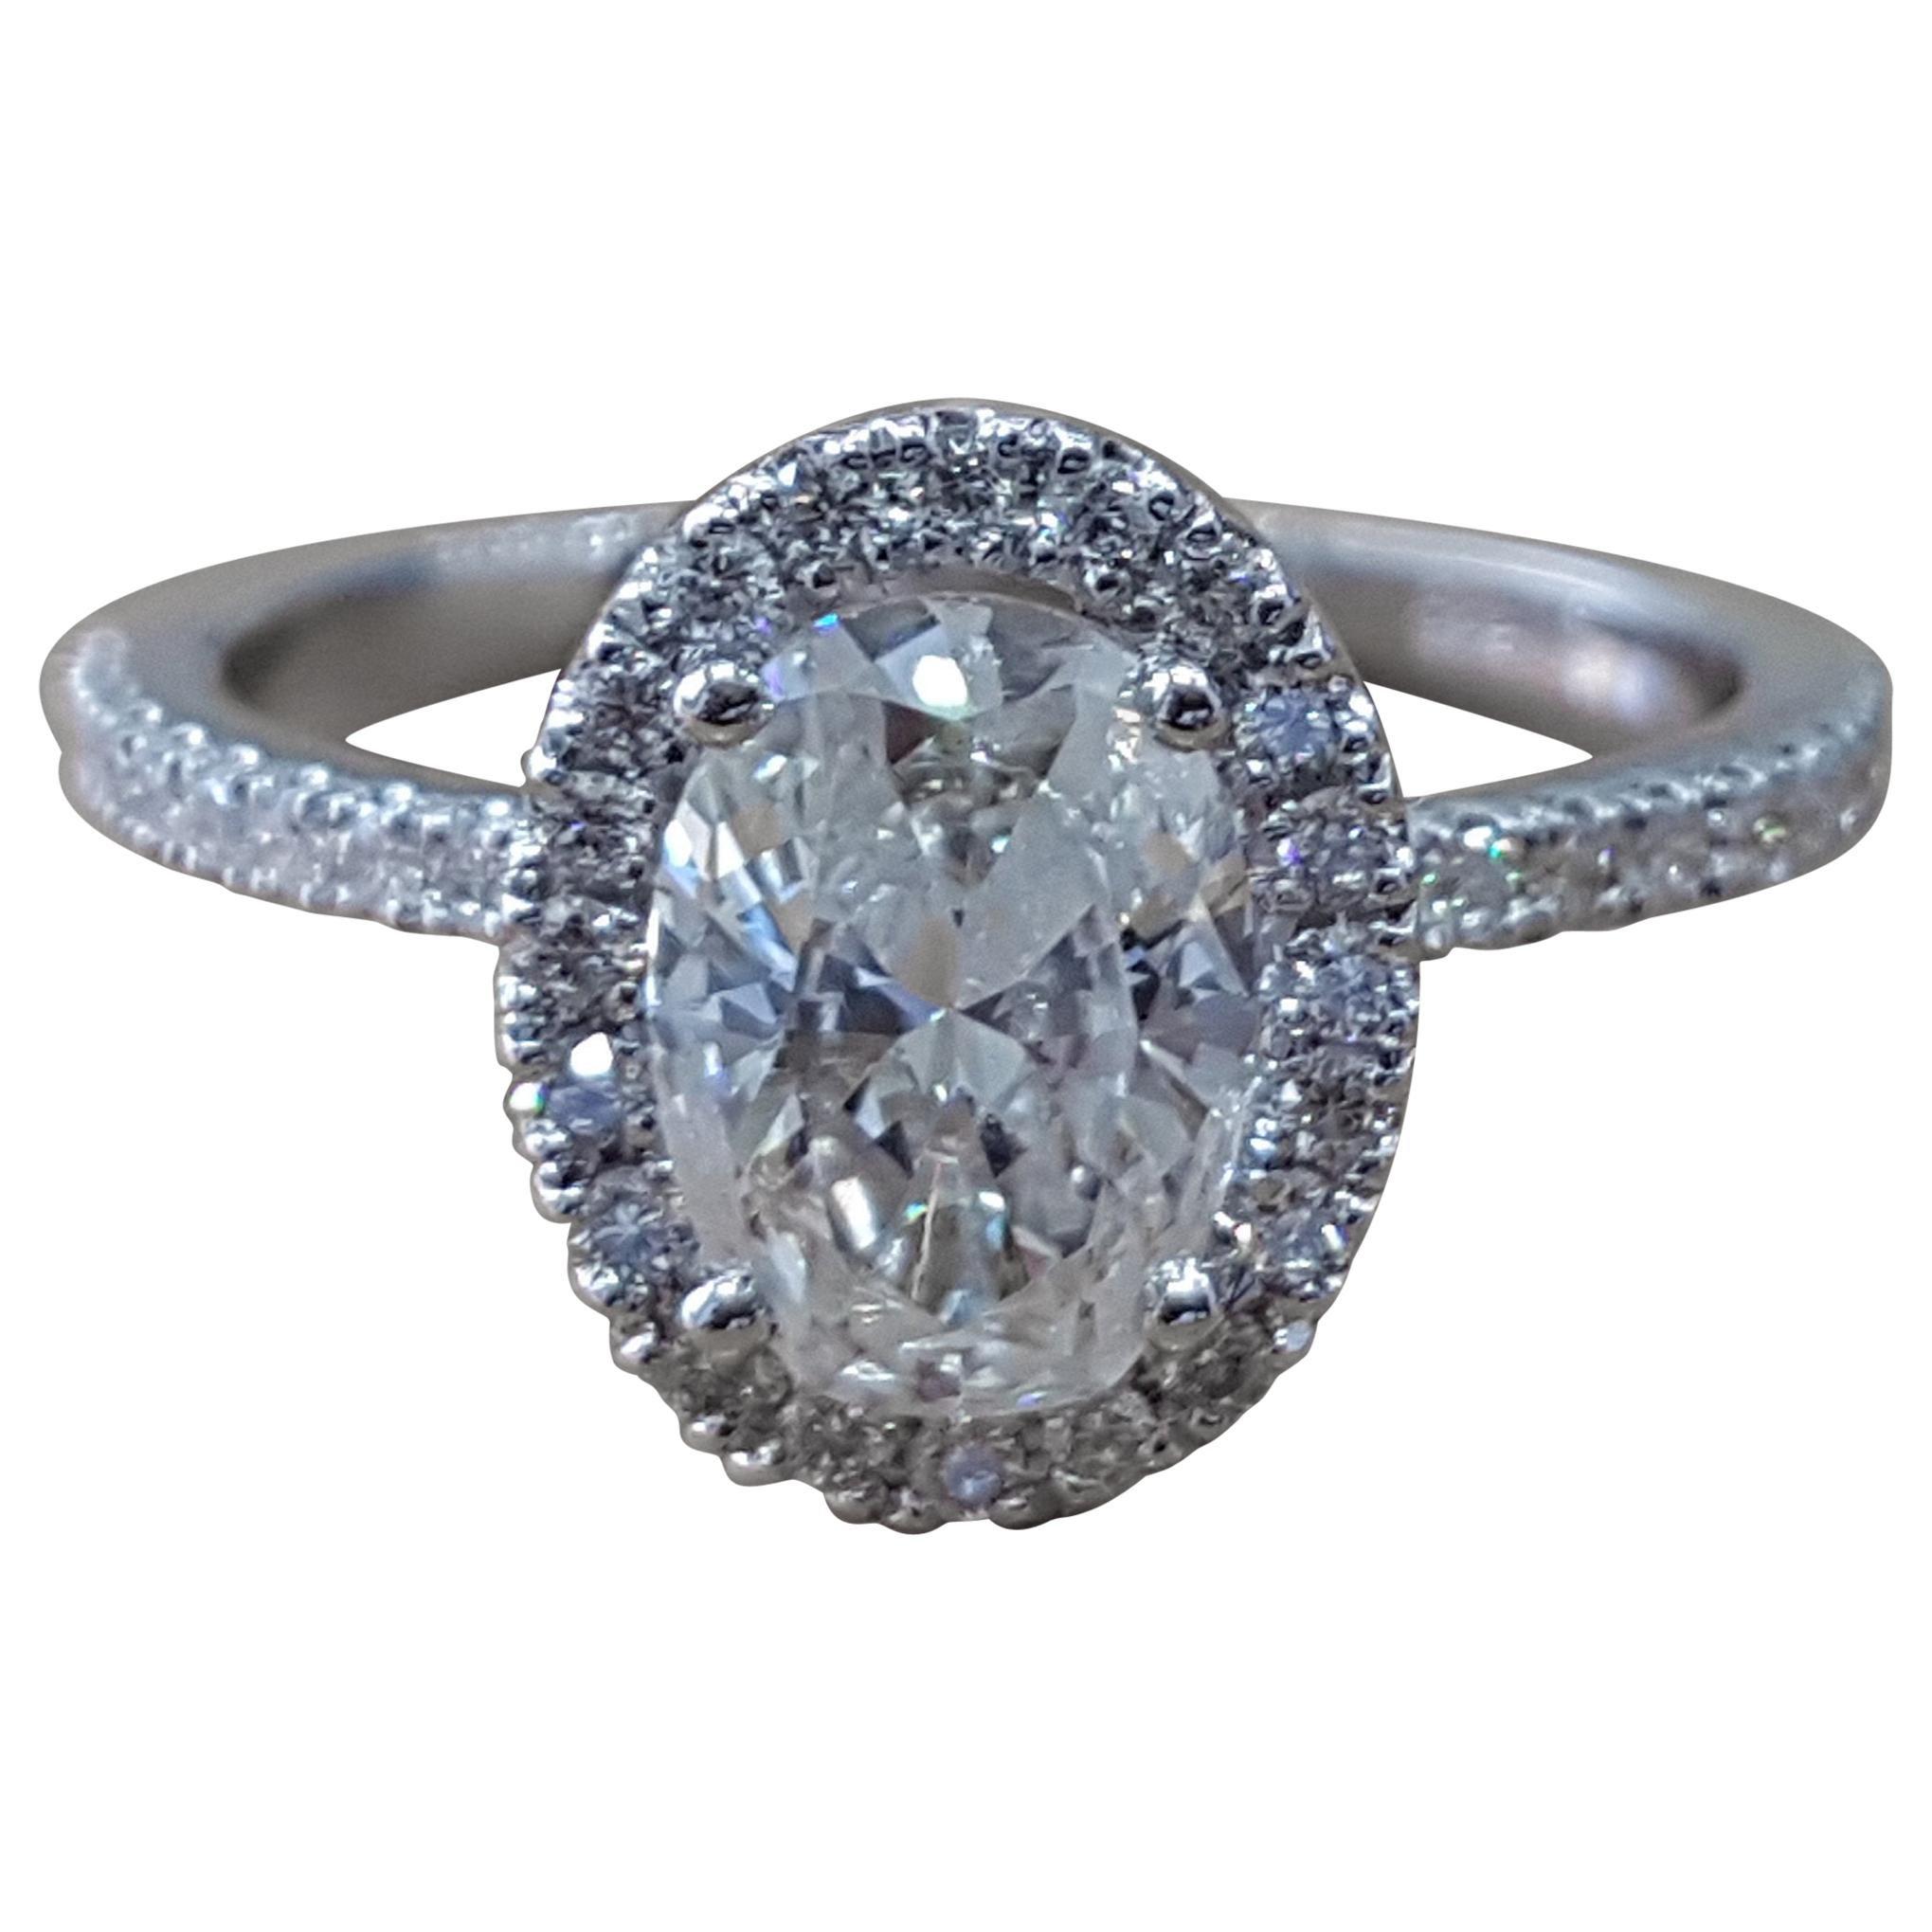 1 3/4 Carat 14 Karat White Gold Oval Diamond Ring, Diamond Halo Art Ring